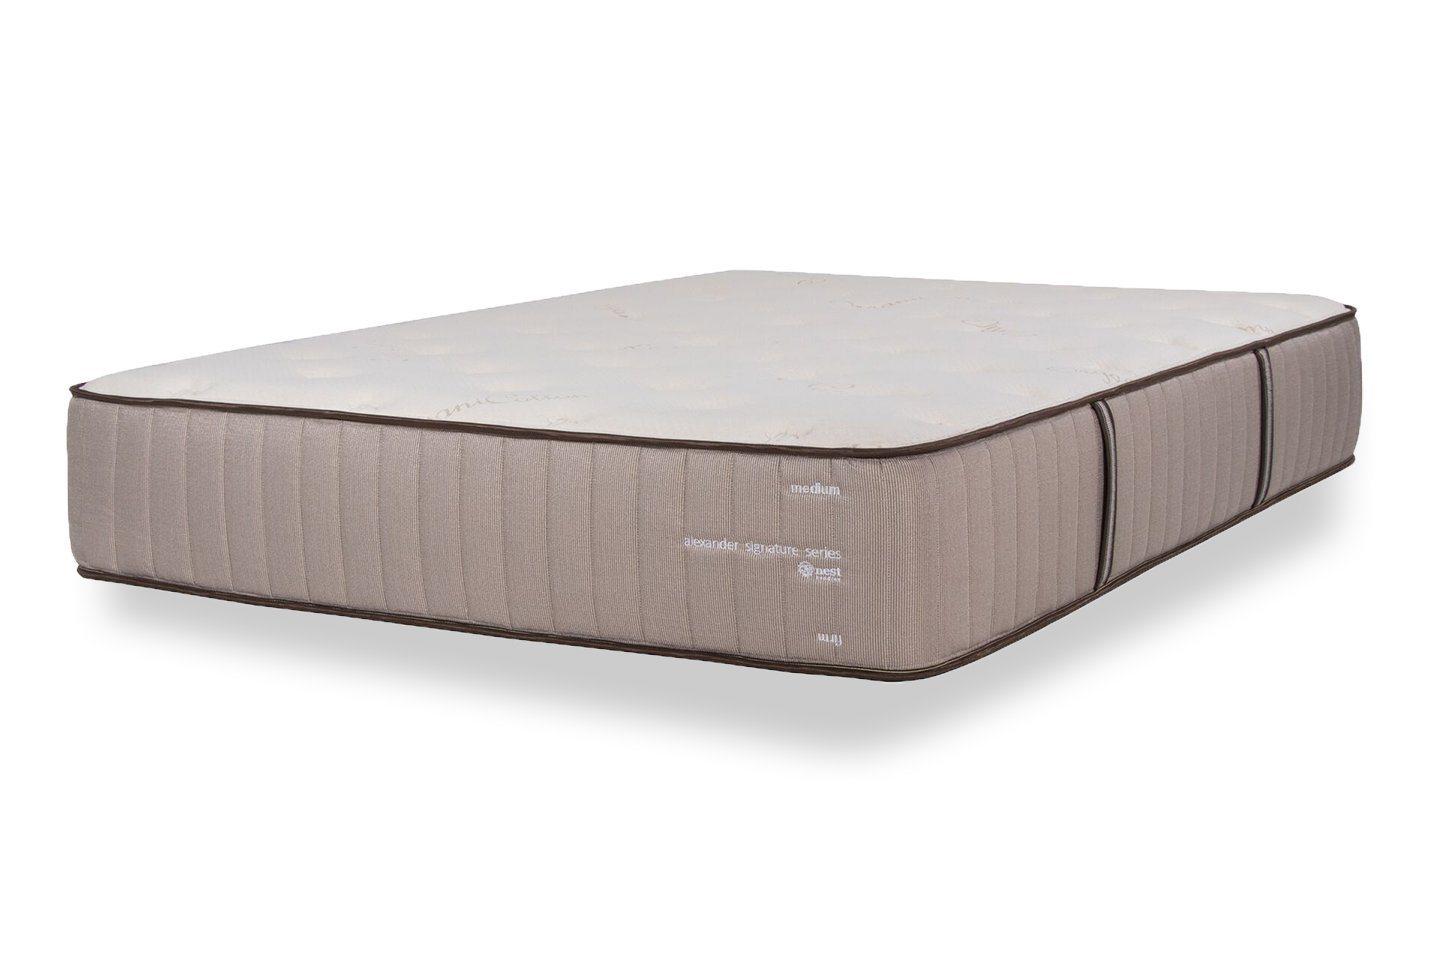 Nest Bedding Alexander Signature Series® Flippable